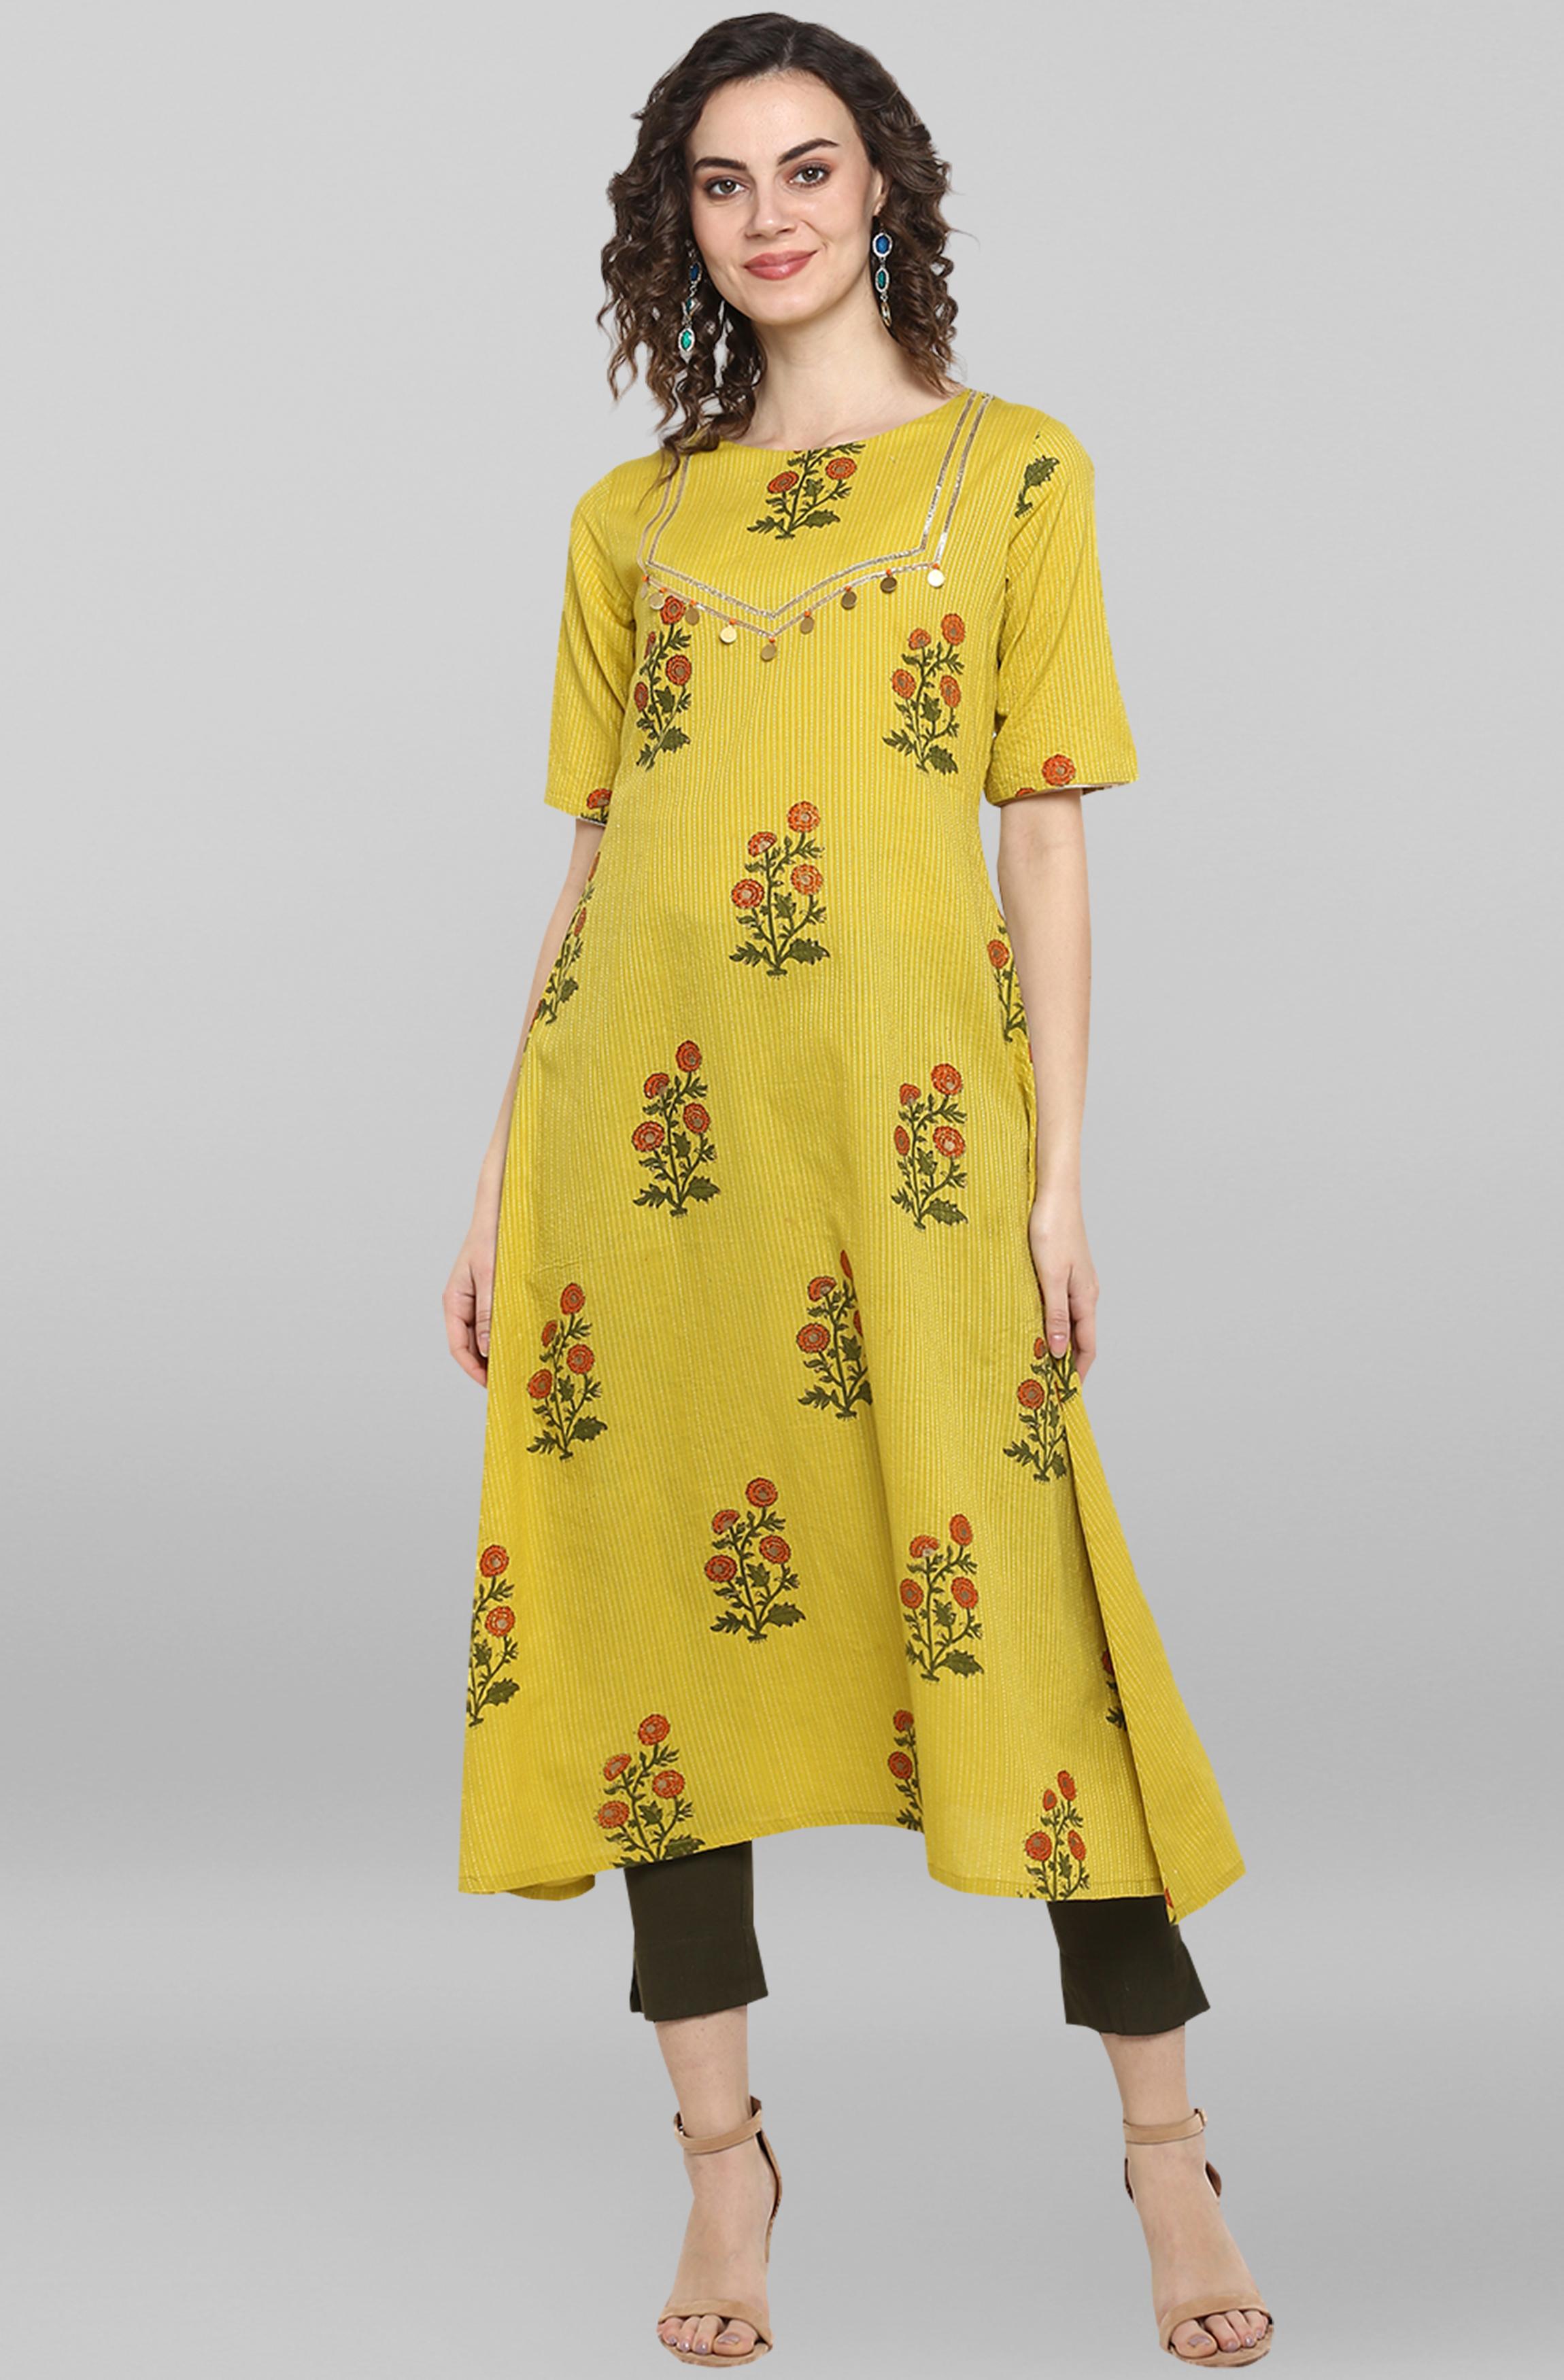 Janasya | Janasya Women's Lemon yellow Cotton Kurta